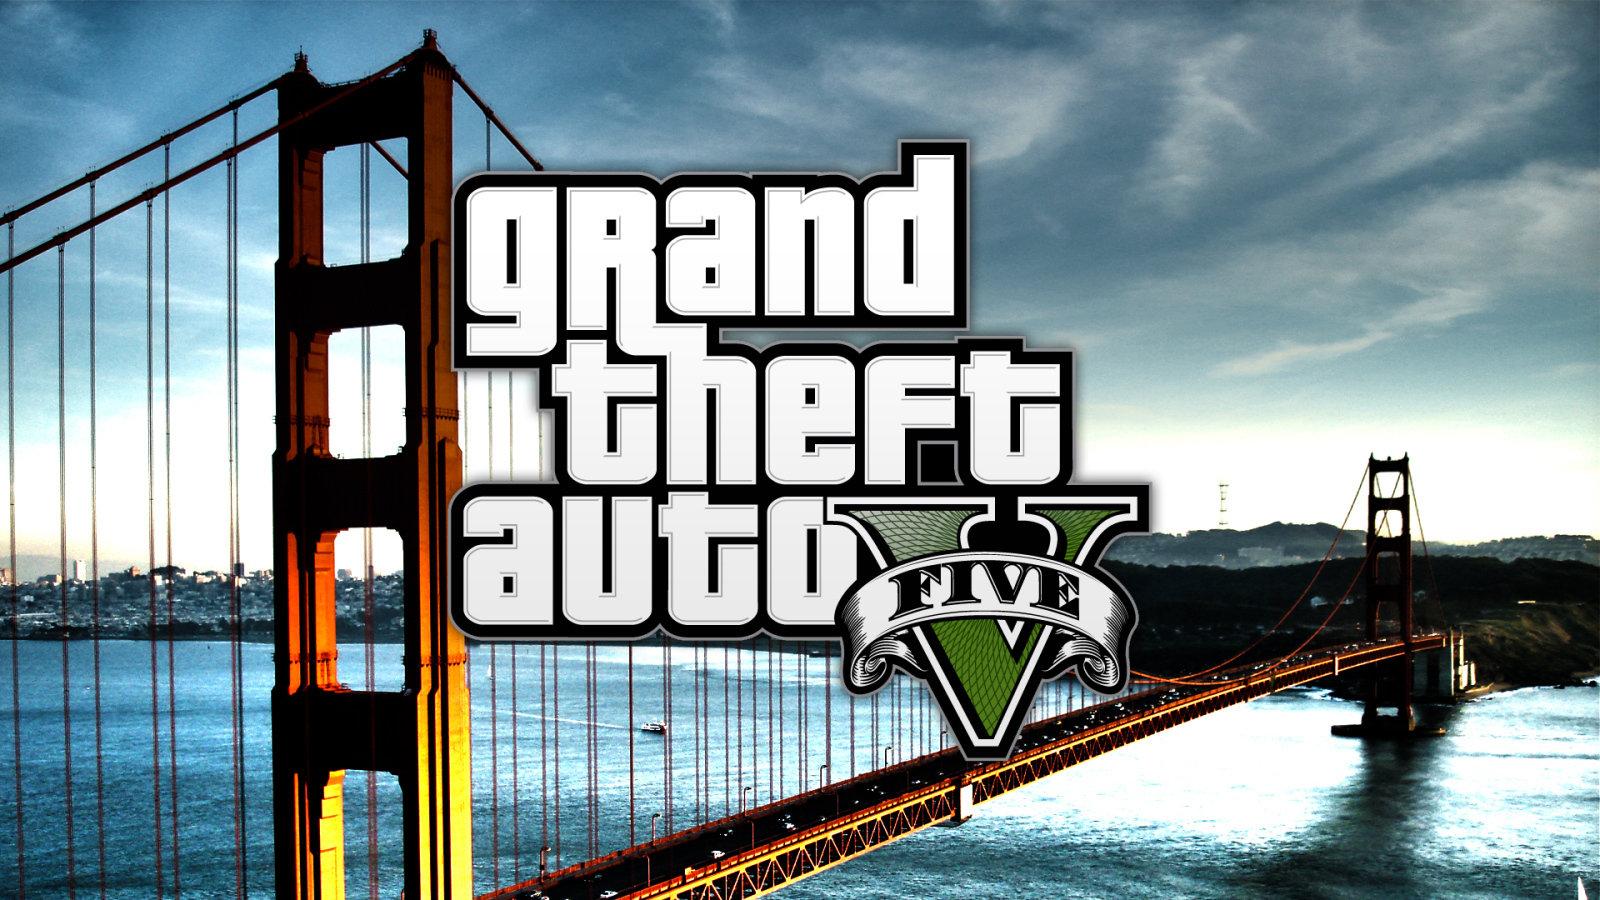 High Resolution Grand Theft Auto V GTA 5 Hd 1600x900 Wallpaper ID195024 For PC